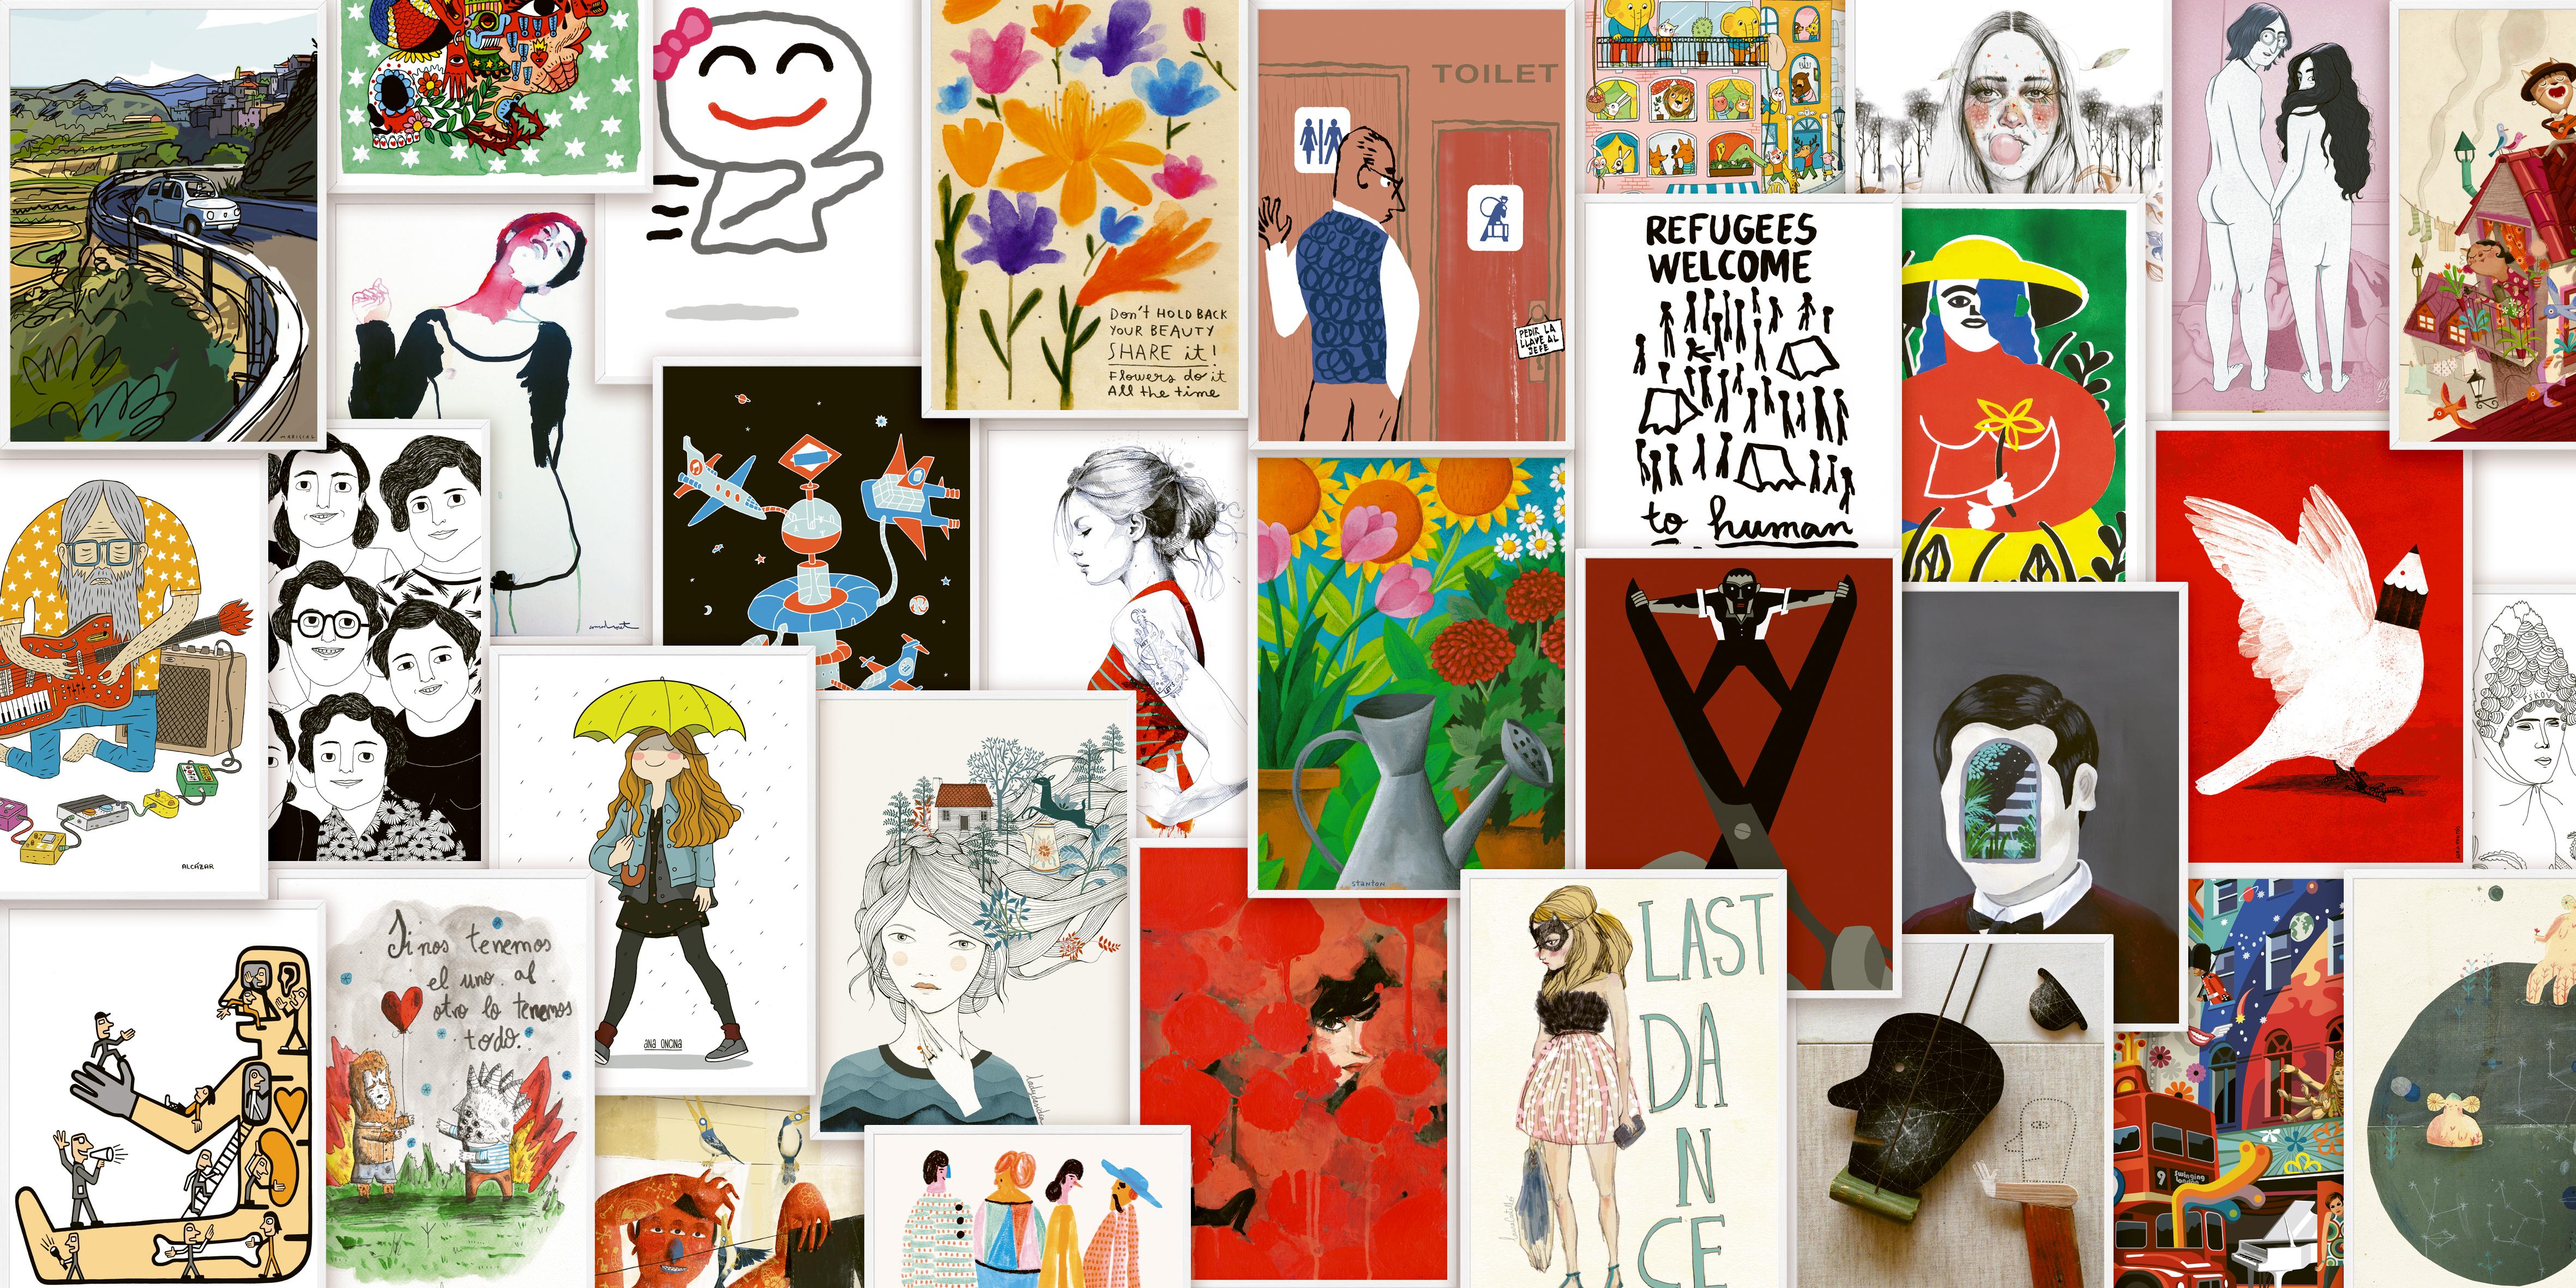 collage-imagenes-dibujos-por-sonrisas.jpg